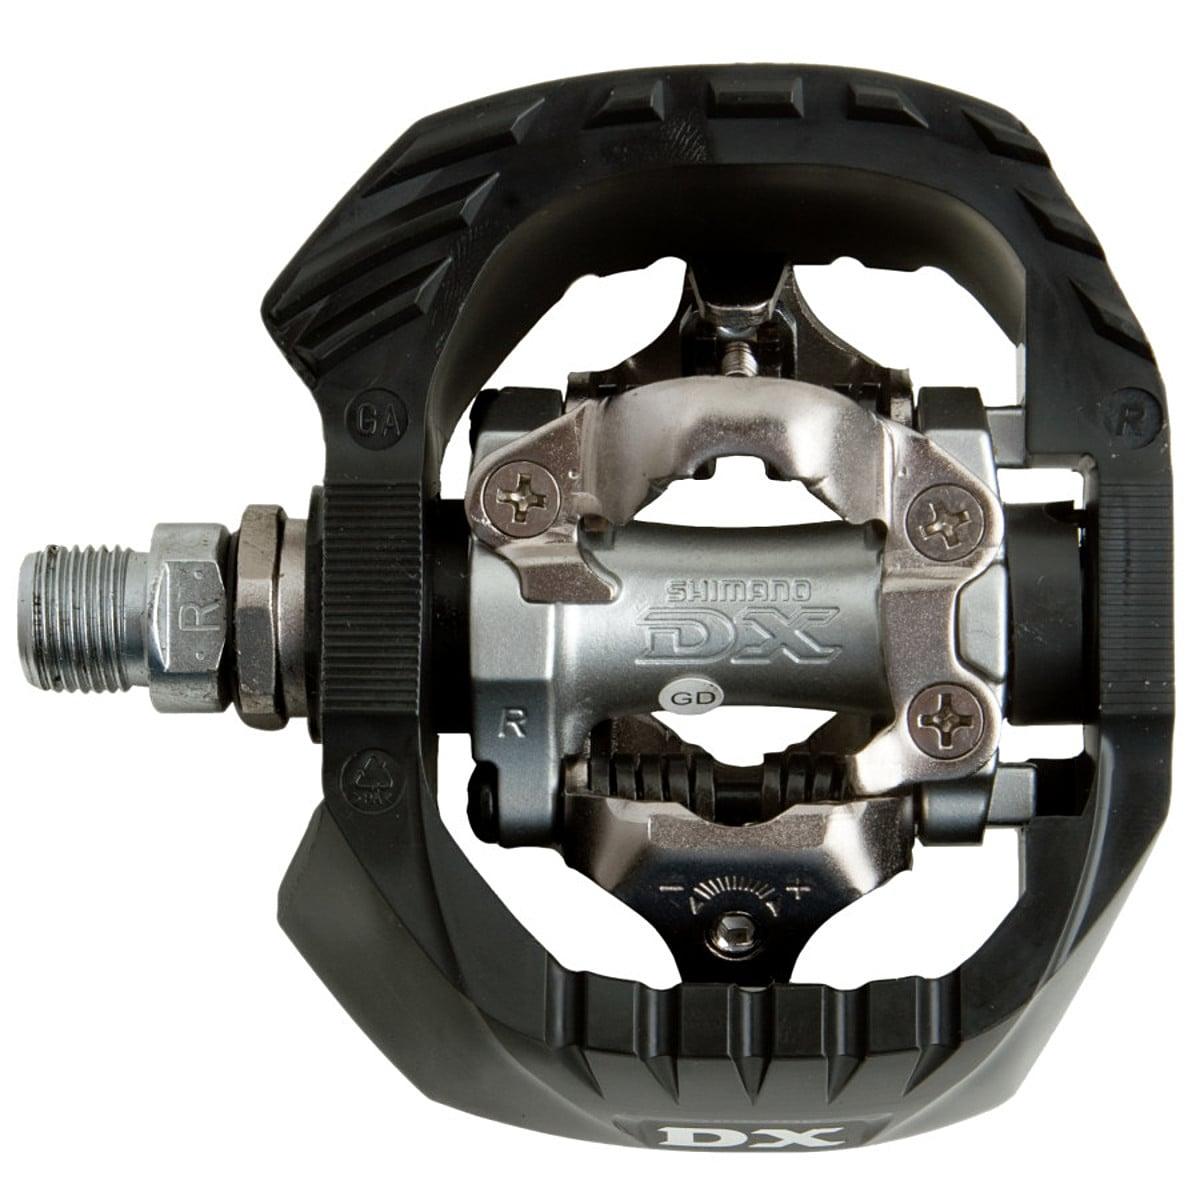 Shimano PD-M647 SPD Dual Platform Pedals